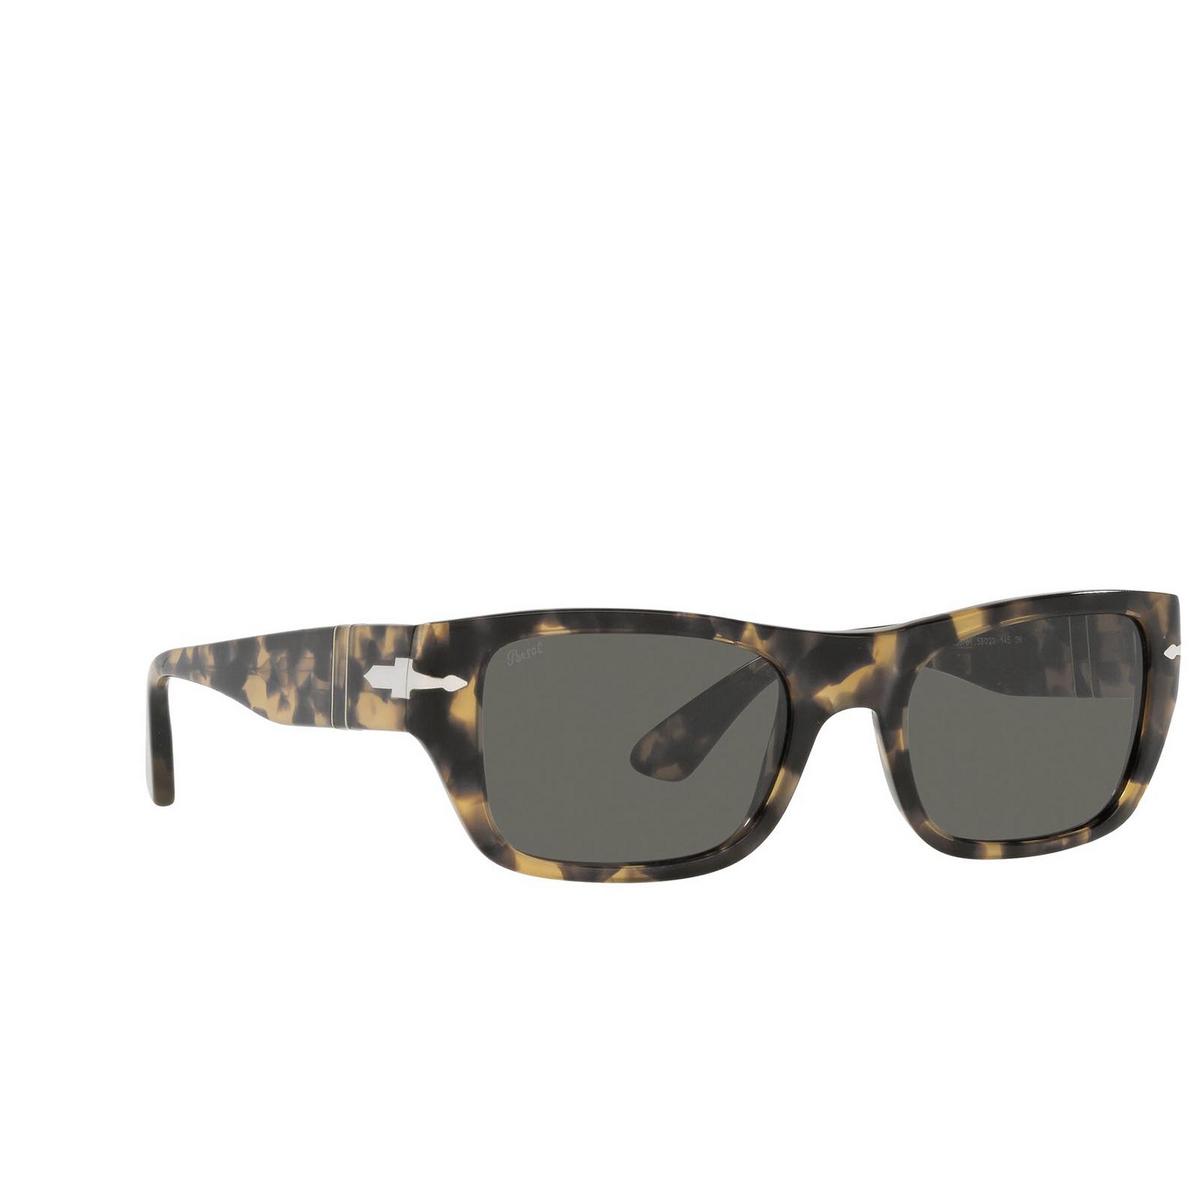 Persol® Rectangle Sunglasses: PO3268S color Brown / Tortoise Beige 1056B1 - three-quarters view.